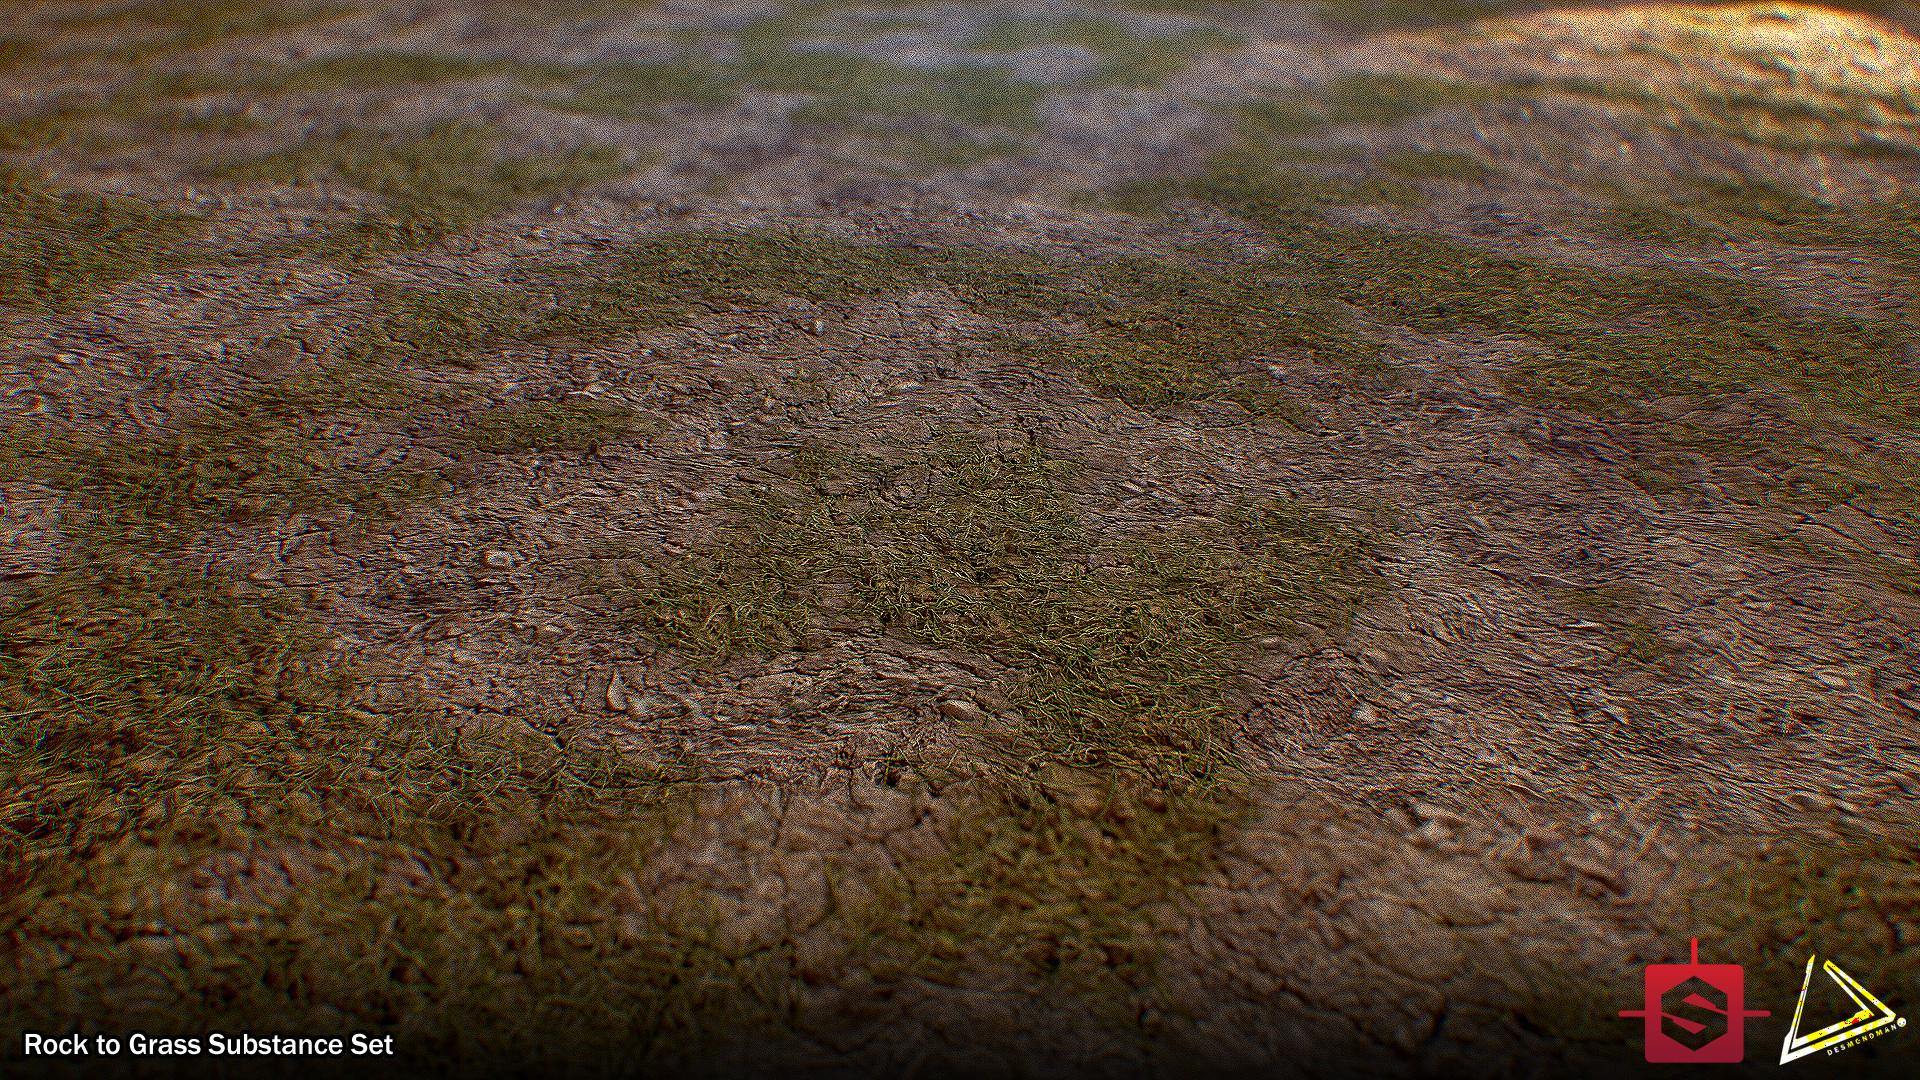 Desmond man rockygrass set terrain renders 03